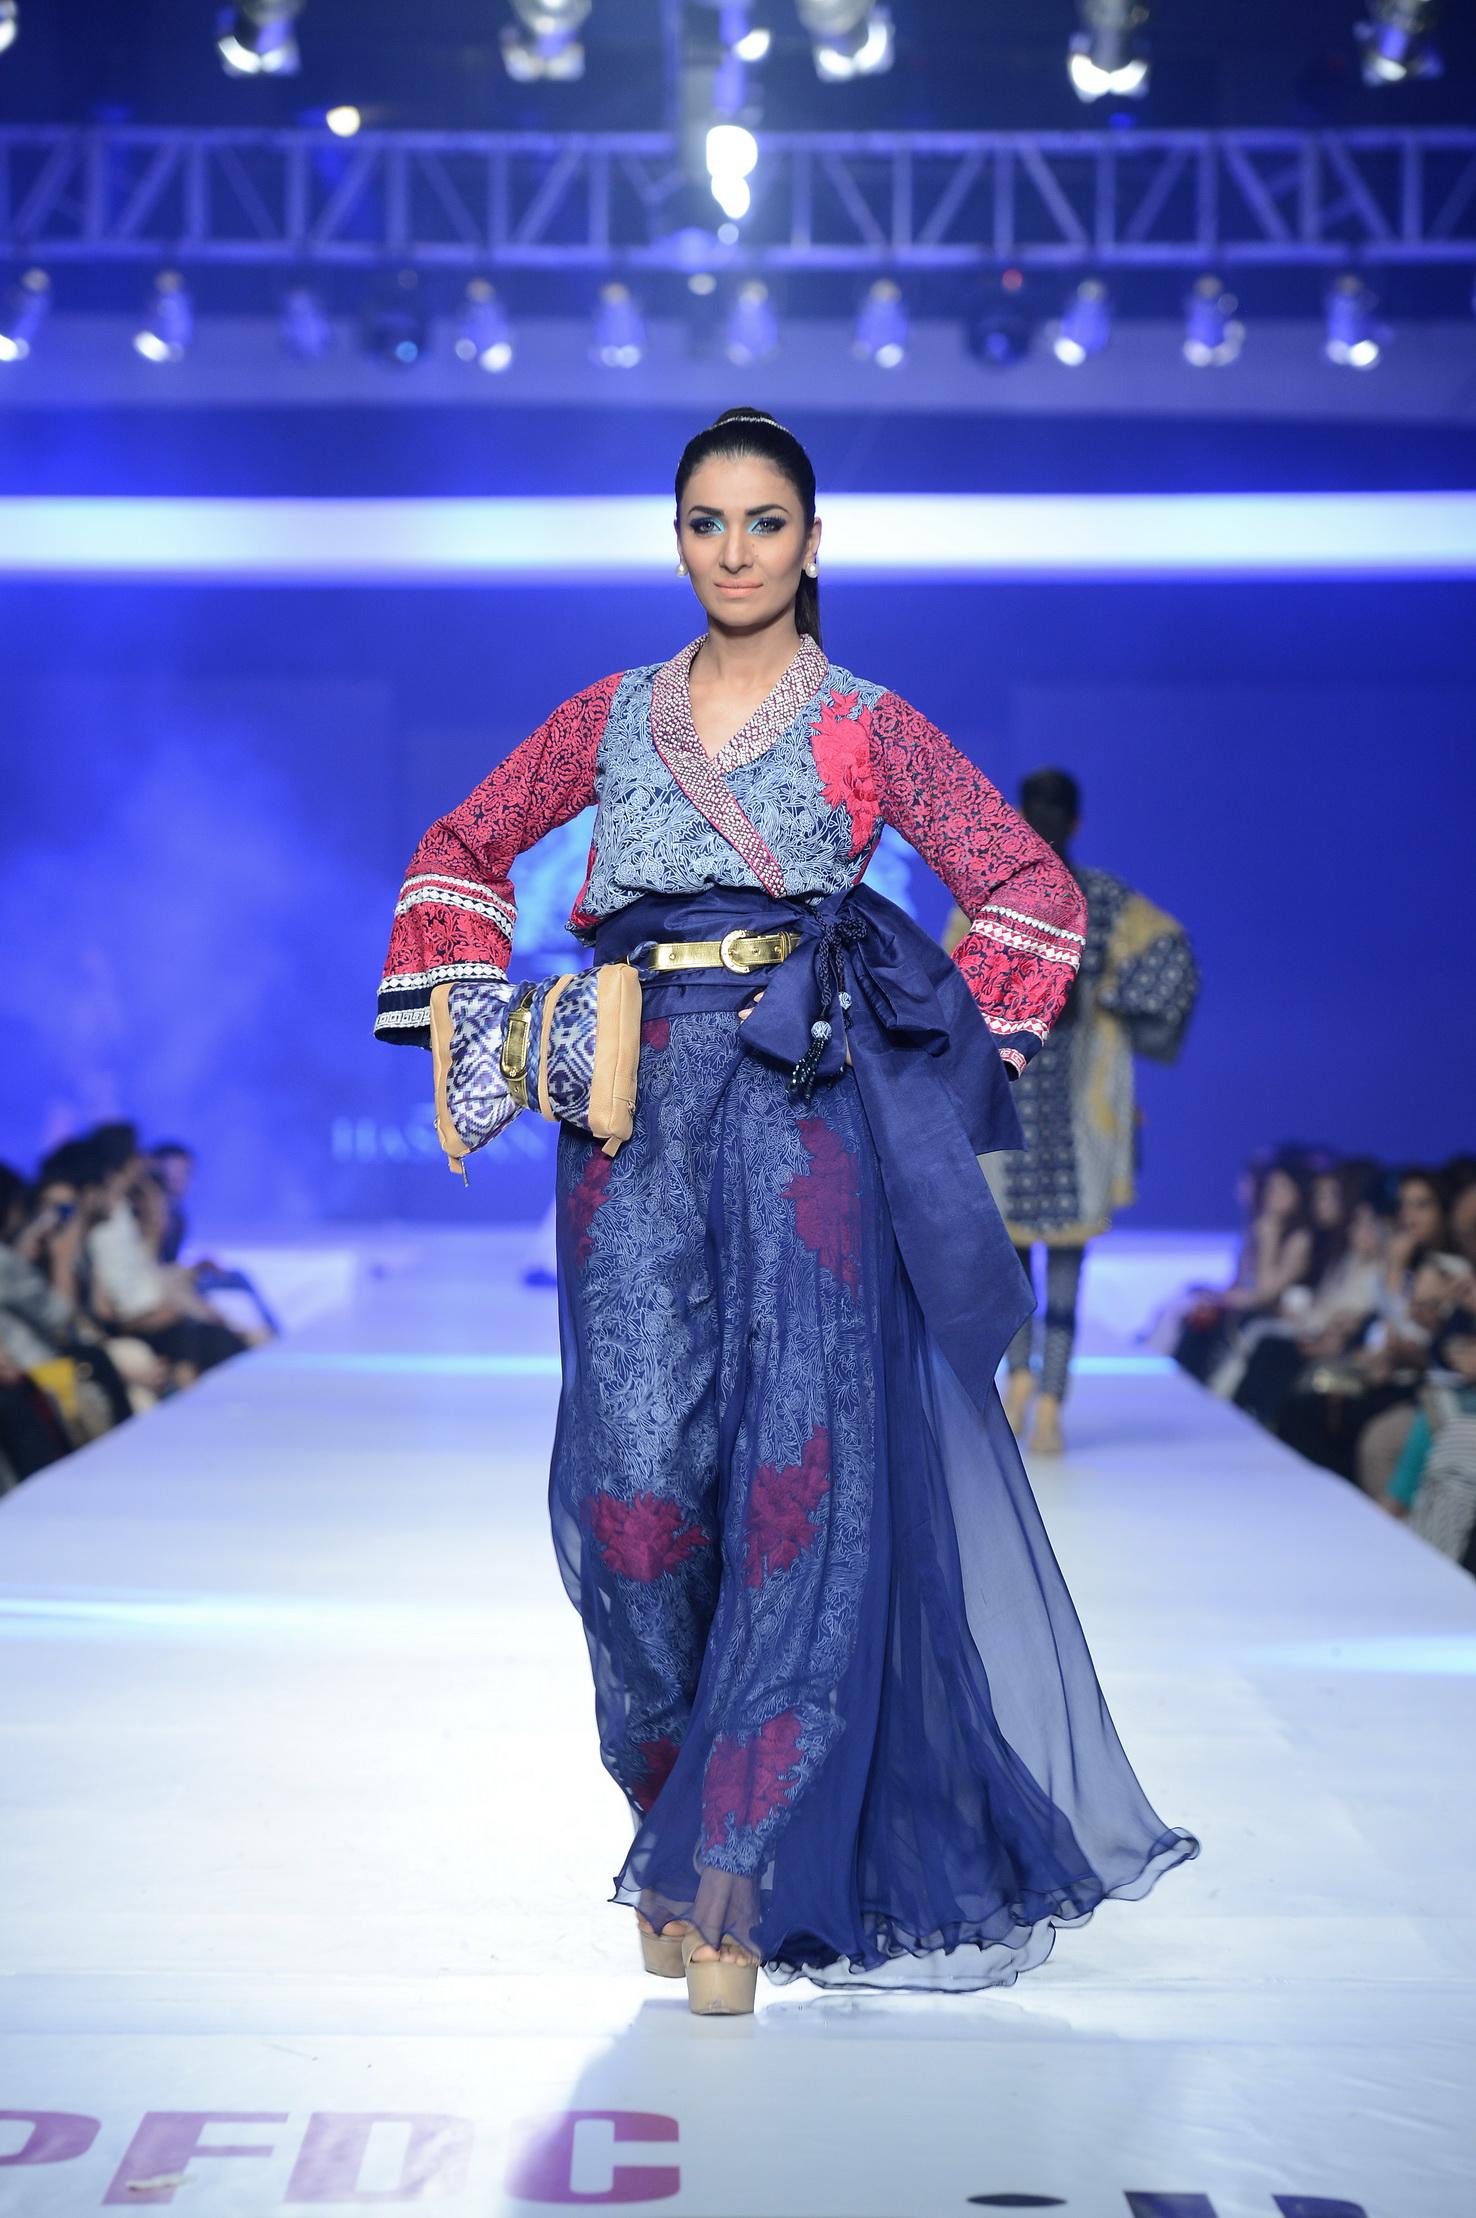 Orientalist Fashion A Fashion Orientalist ...